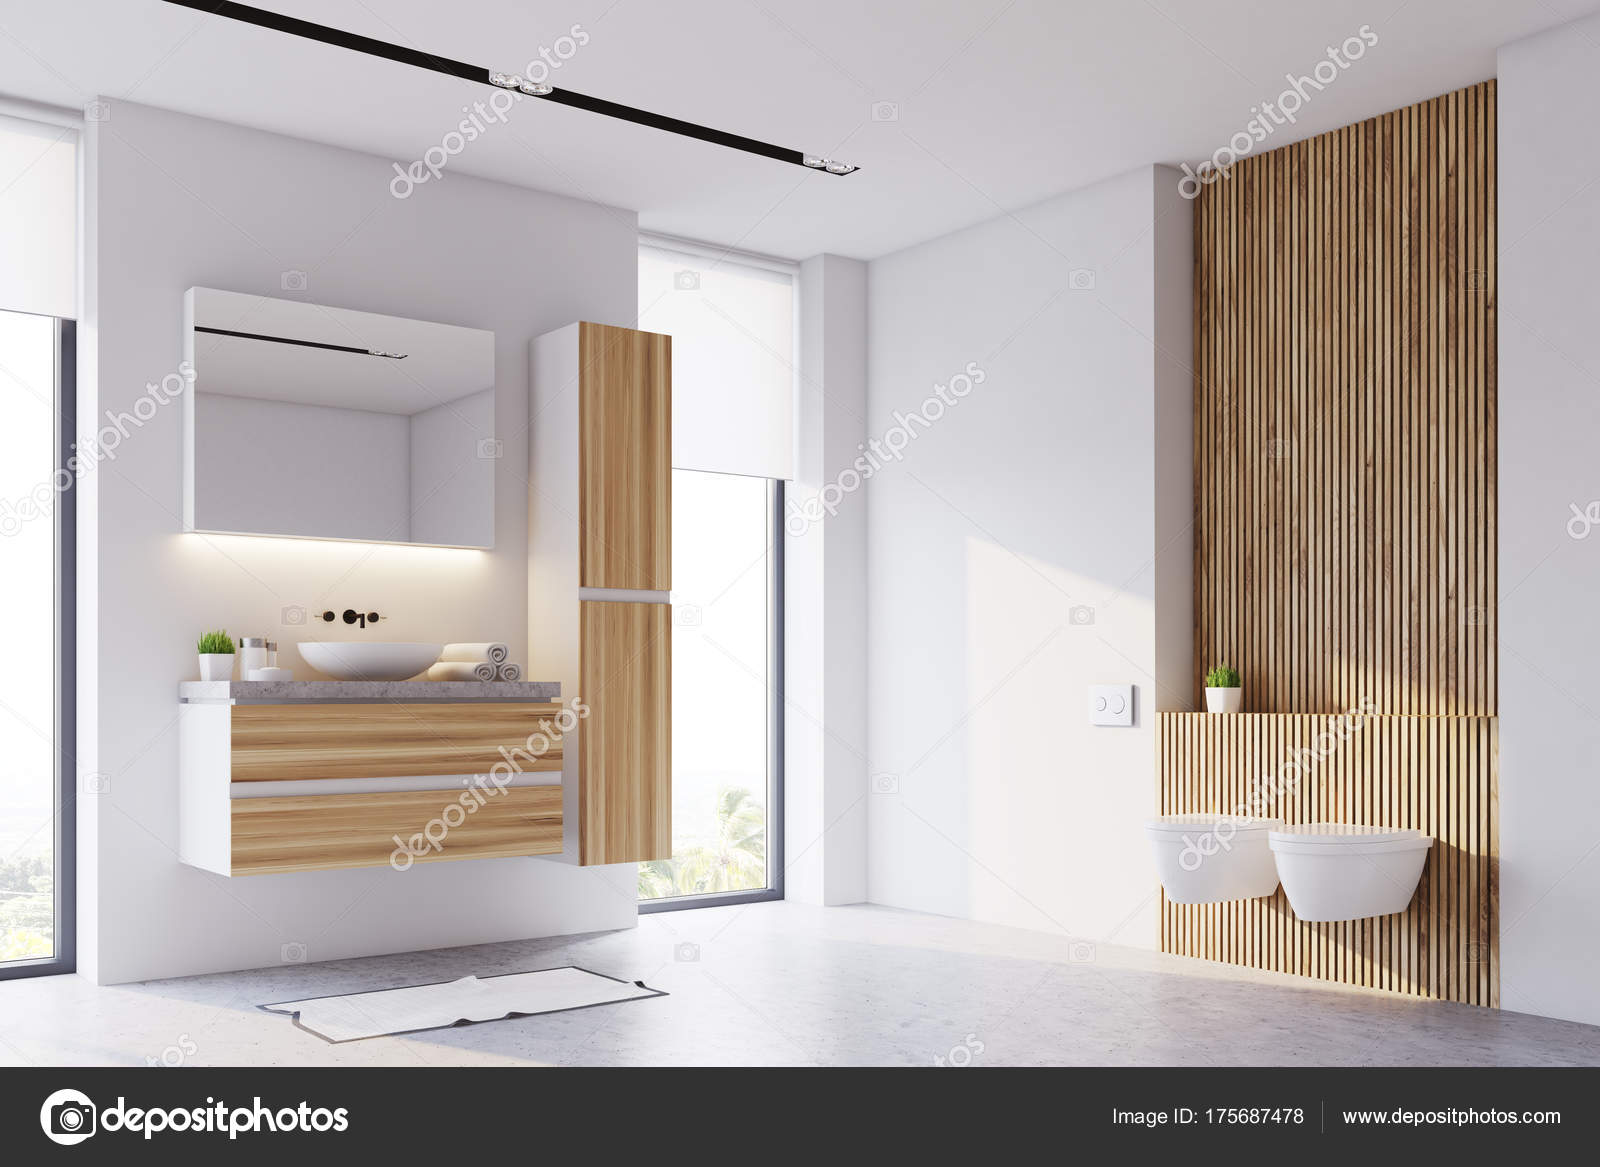 Binnenkant van de witte en houten badkamer u stockfoto